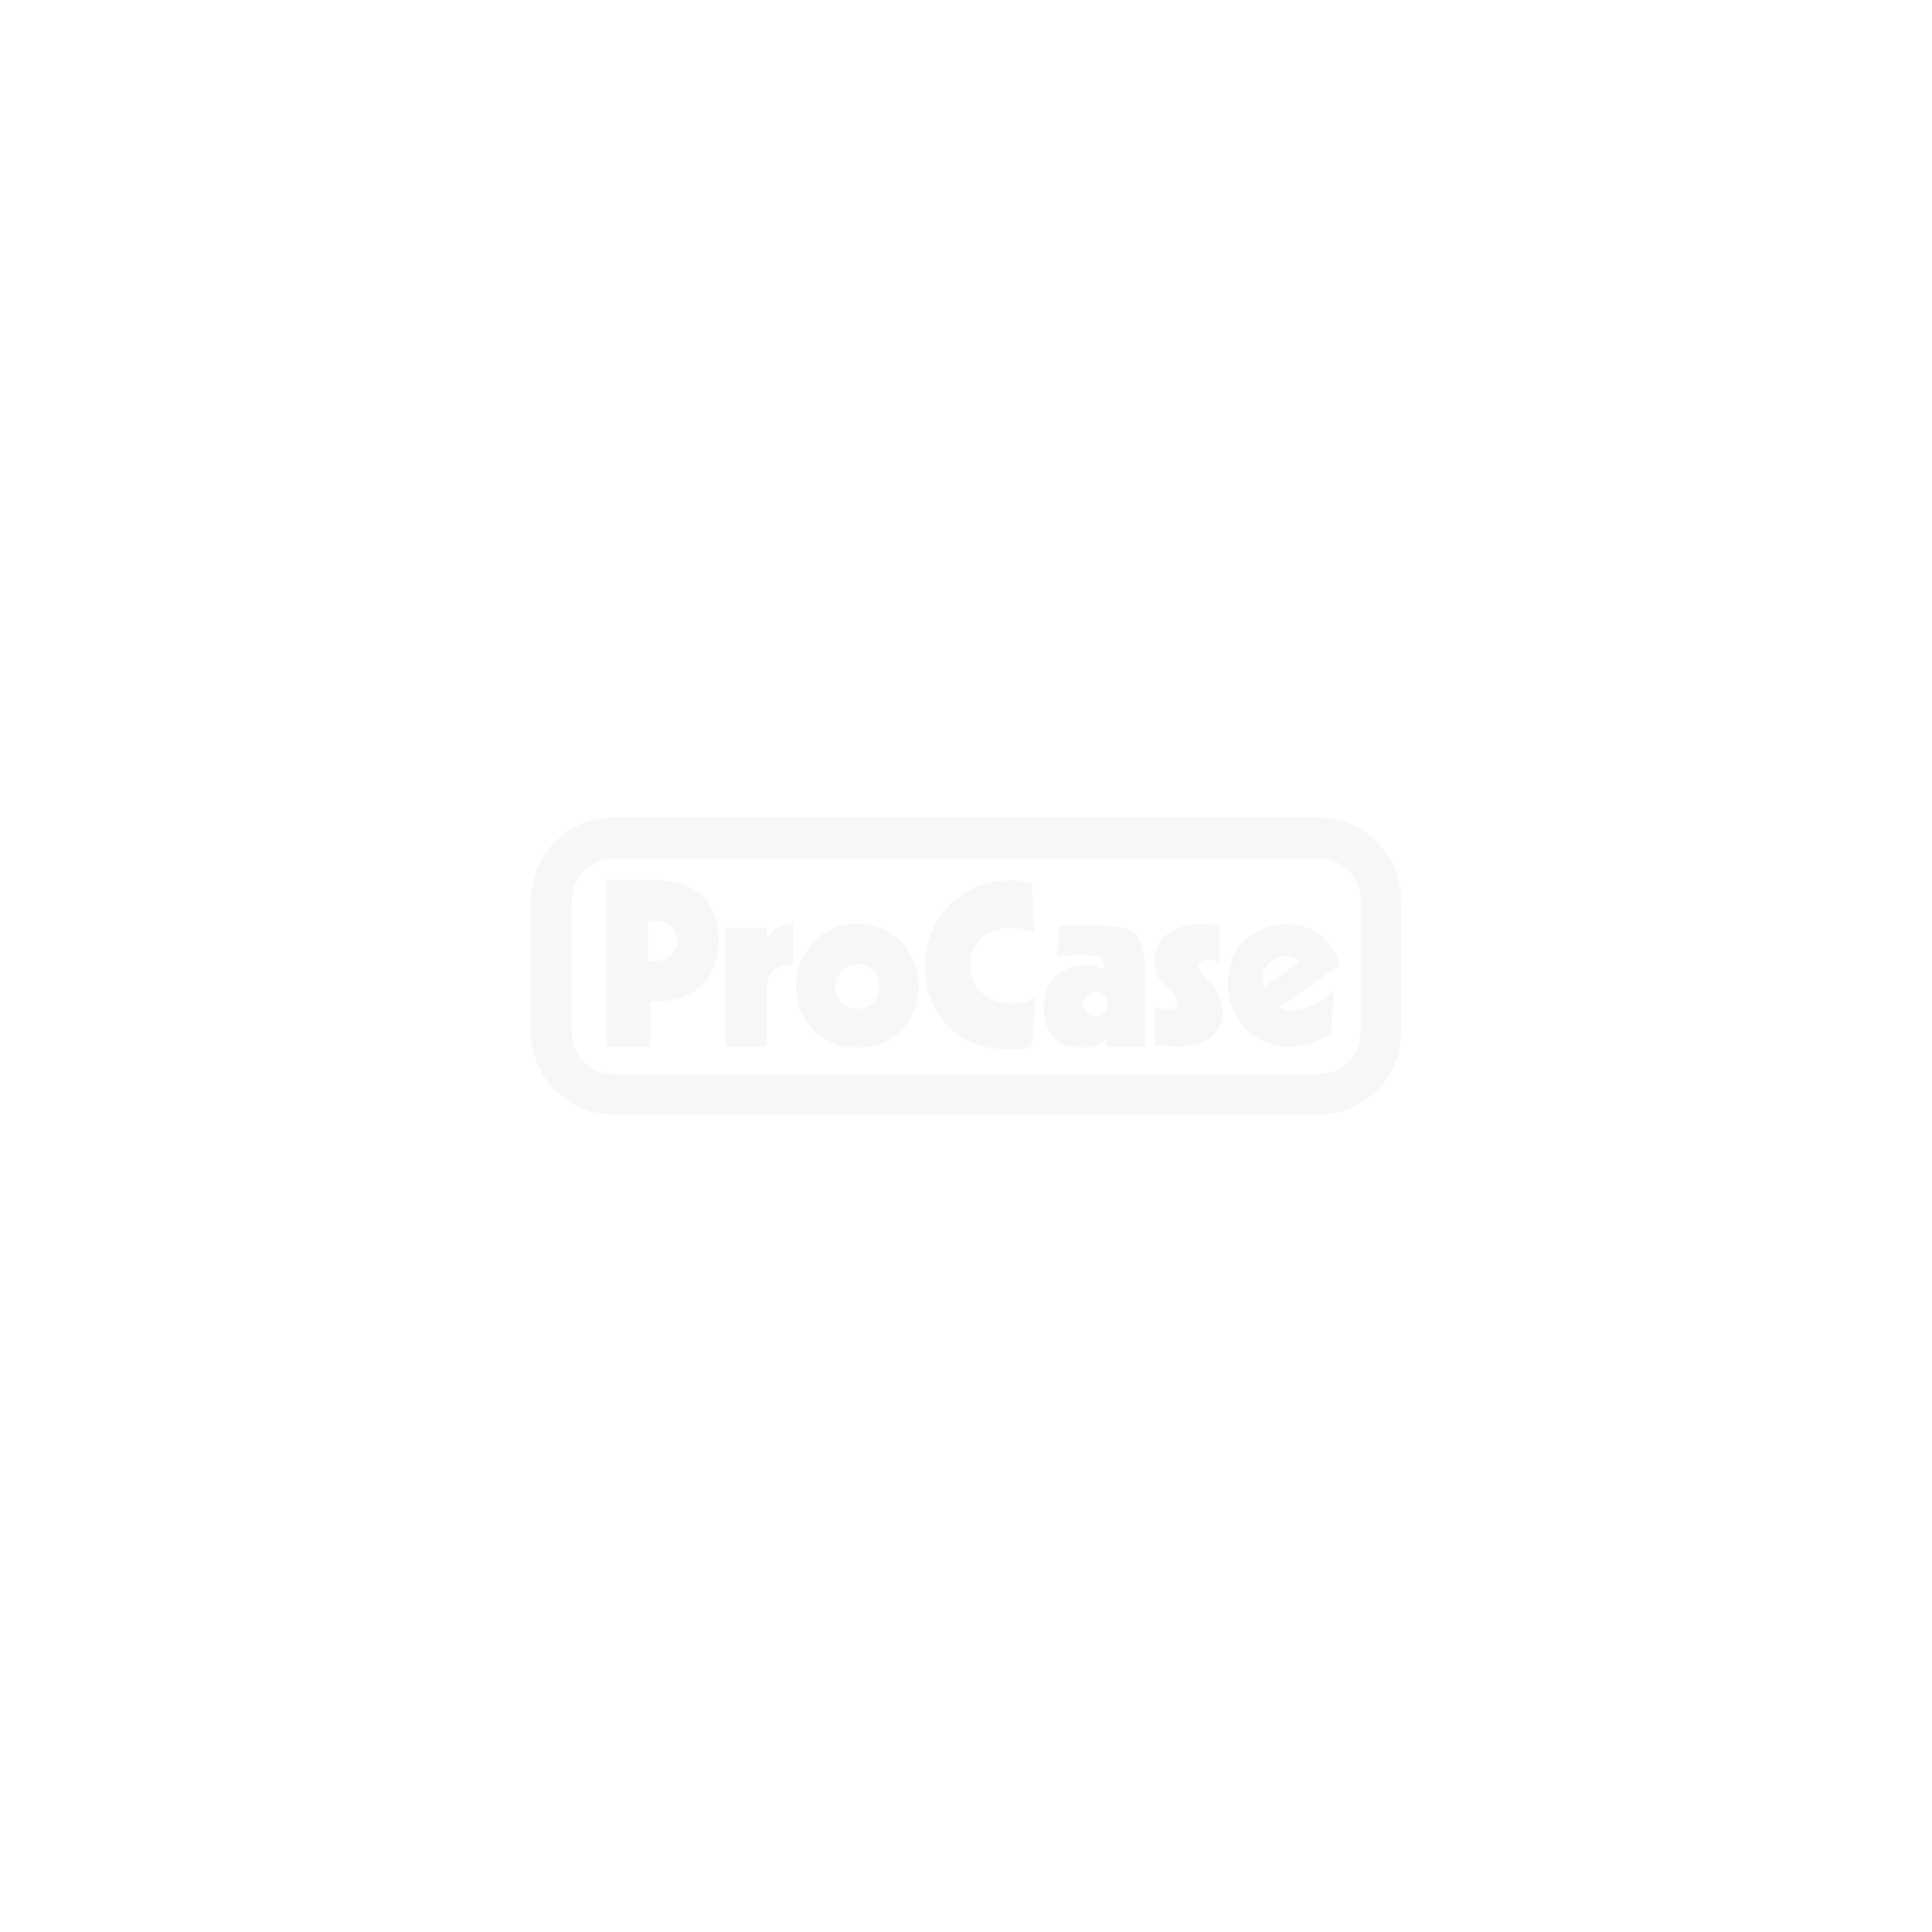 SKB 3i Koffer 1209-4B mit Rasterschaumstoff 2